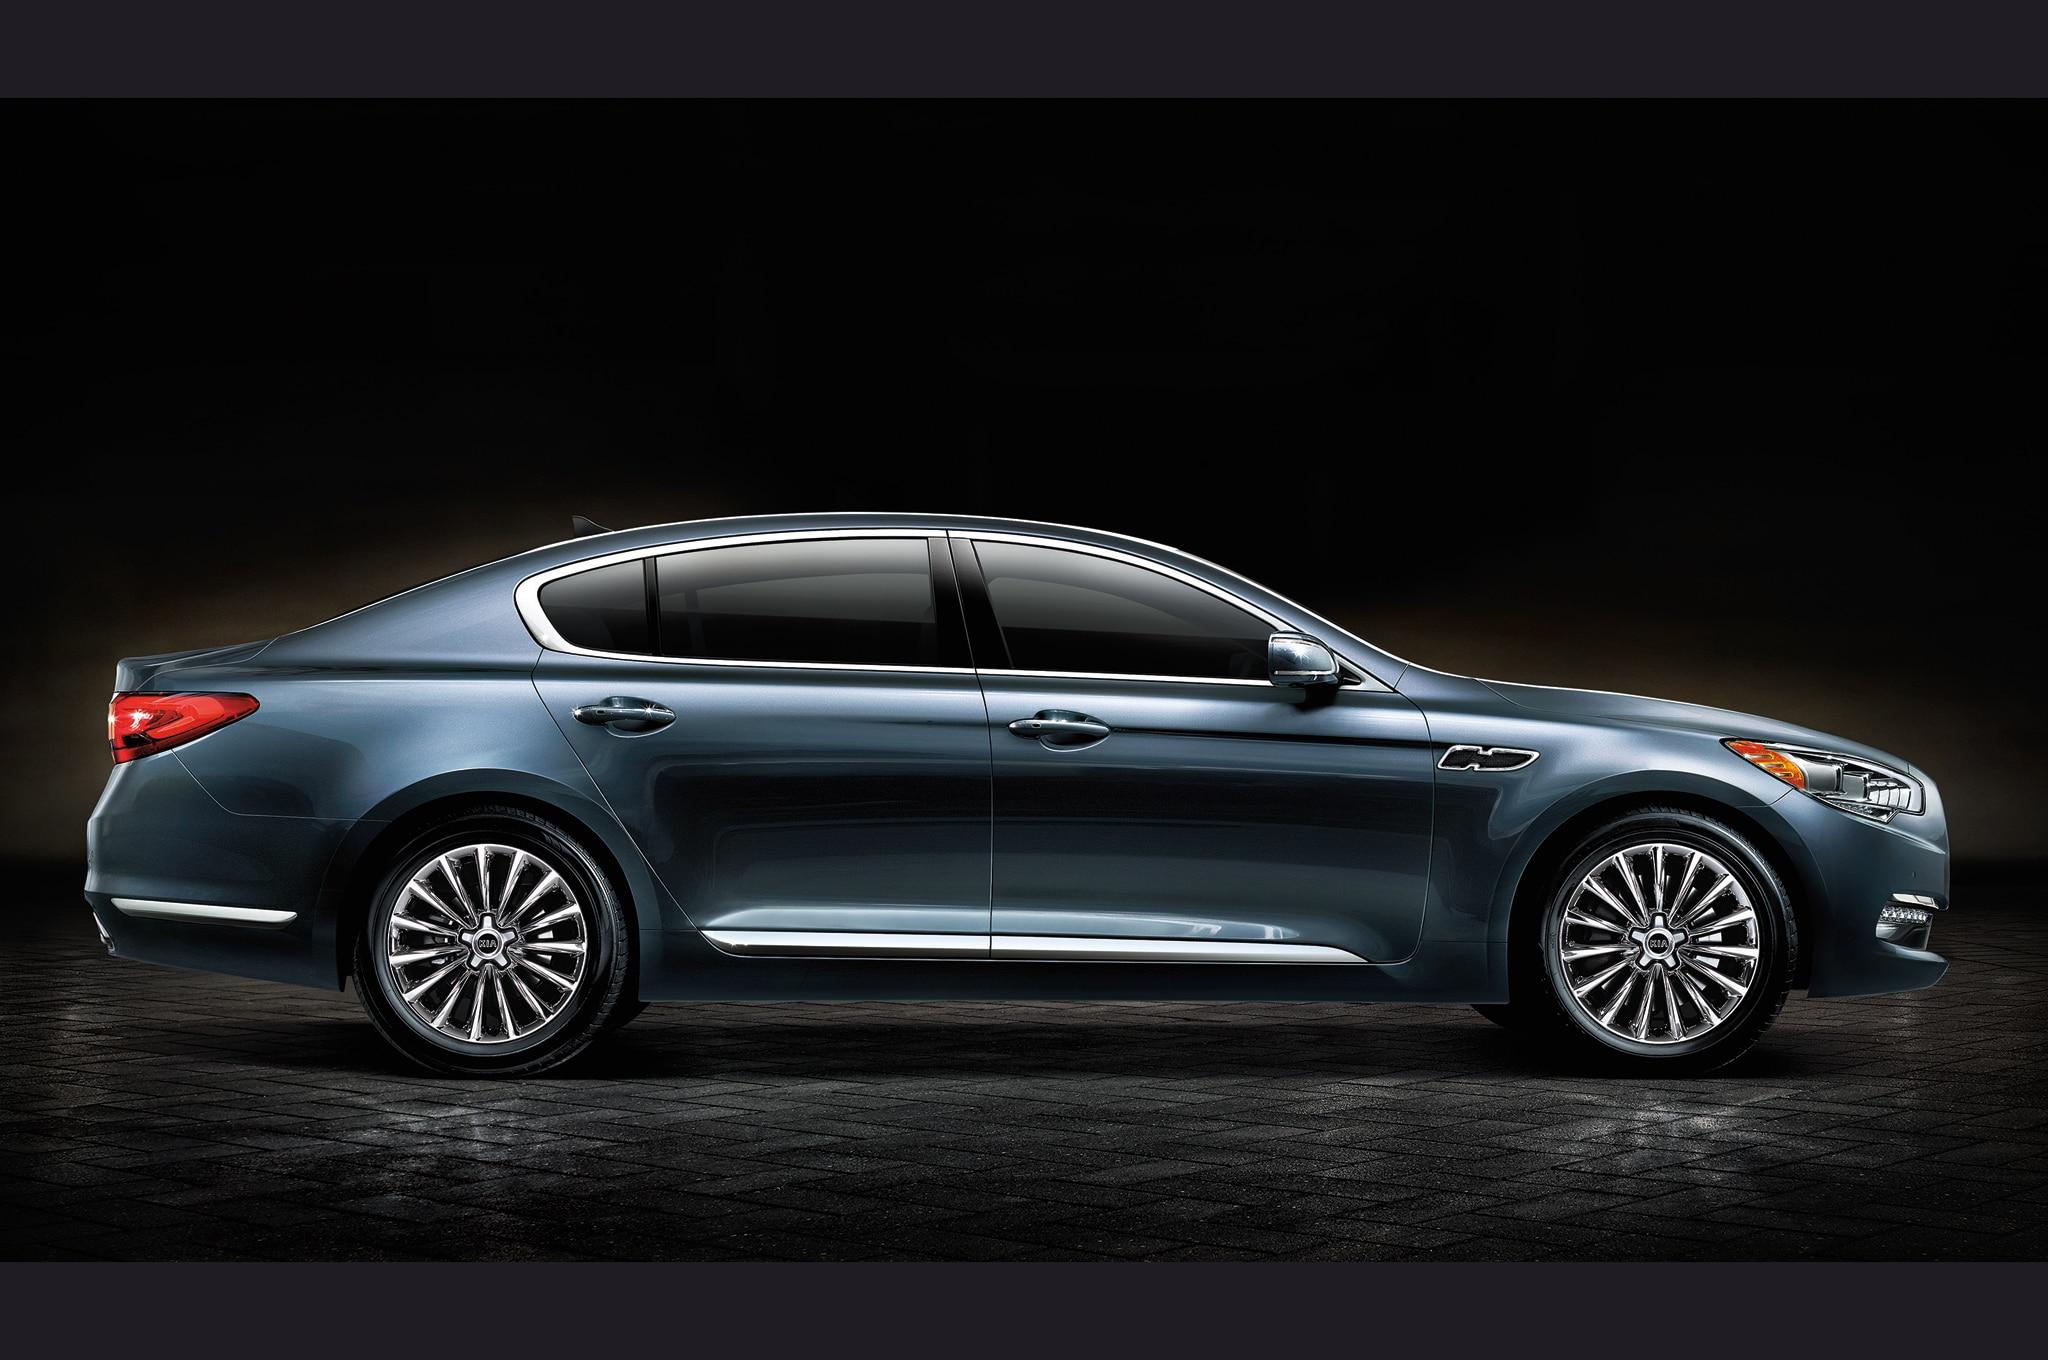 2015 Kia K900 Teaser Profile1